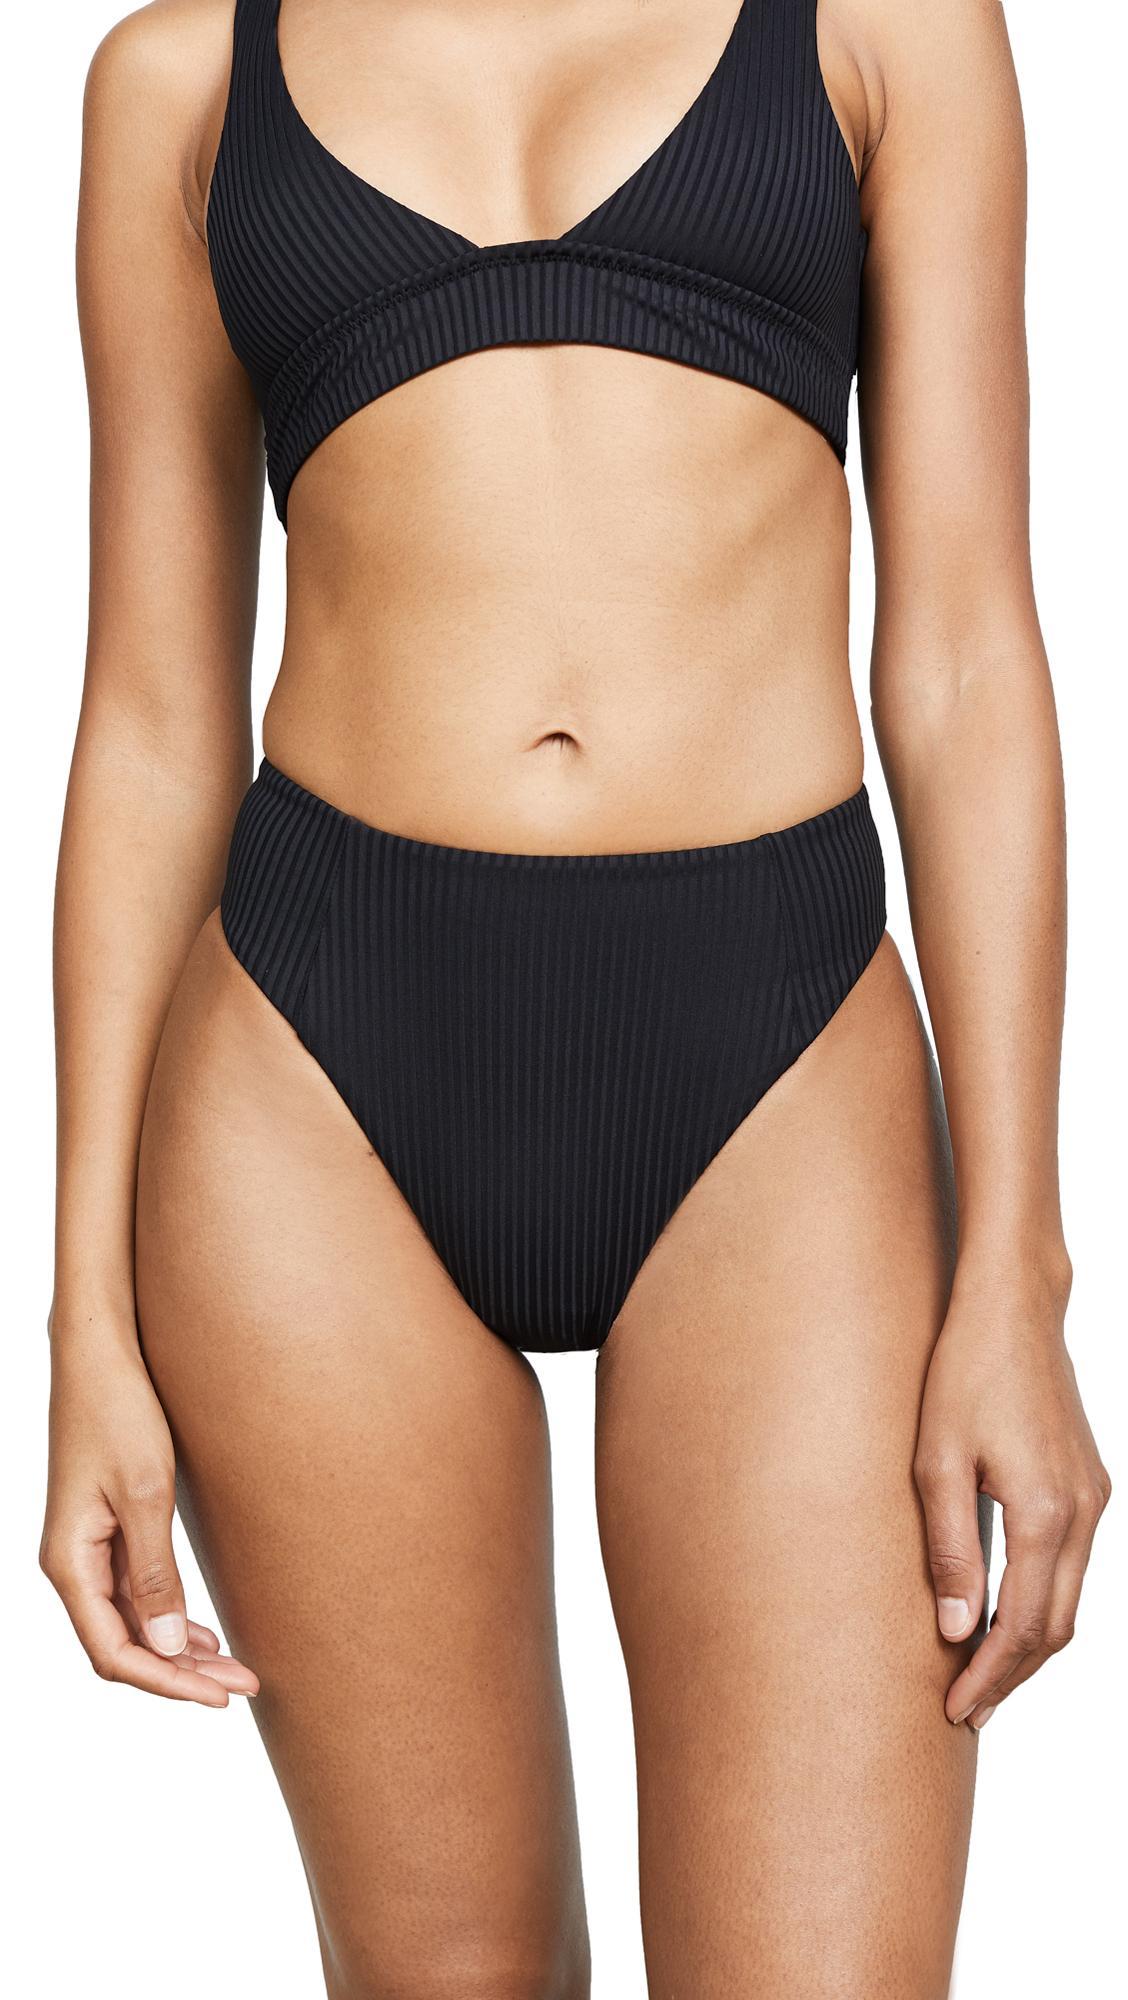 dcc4d2154c1 Shop Vitamin A Bikinis for Women | ModeSens